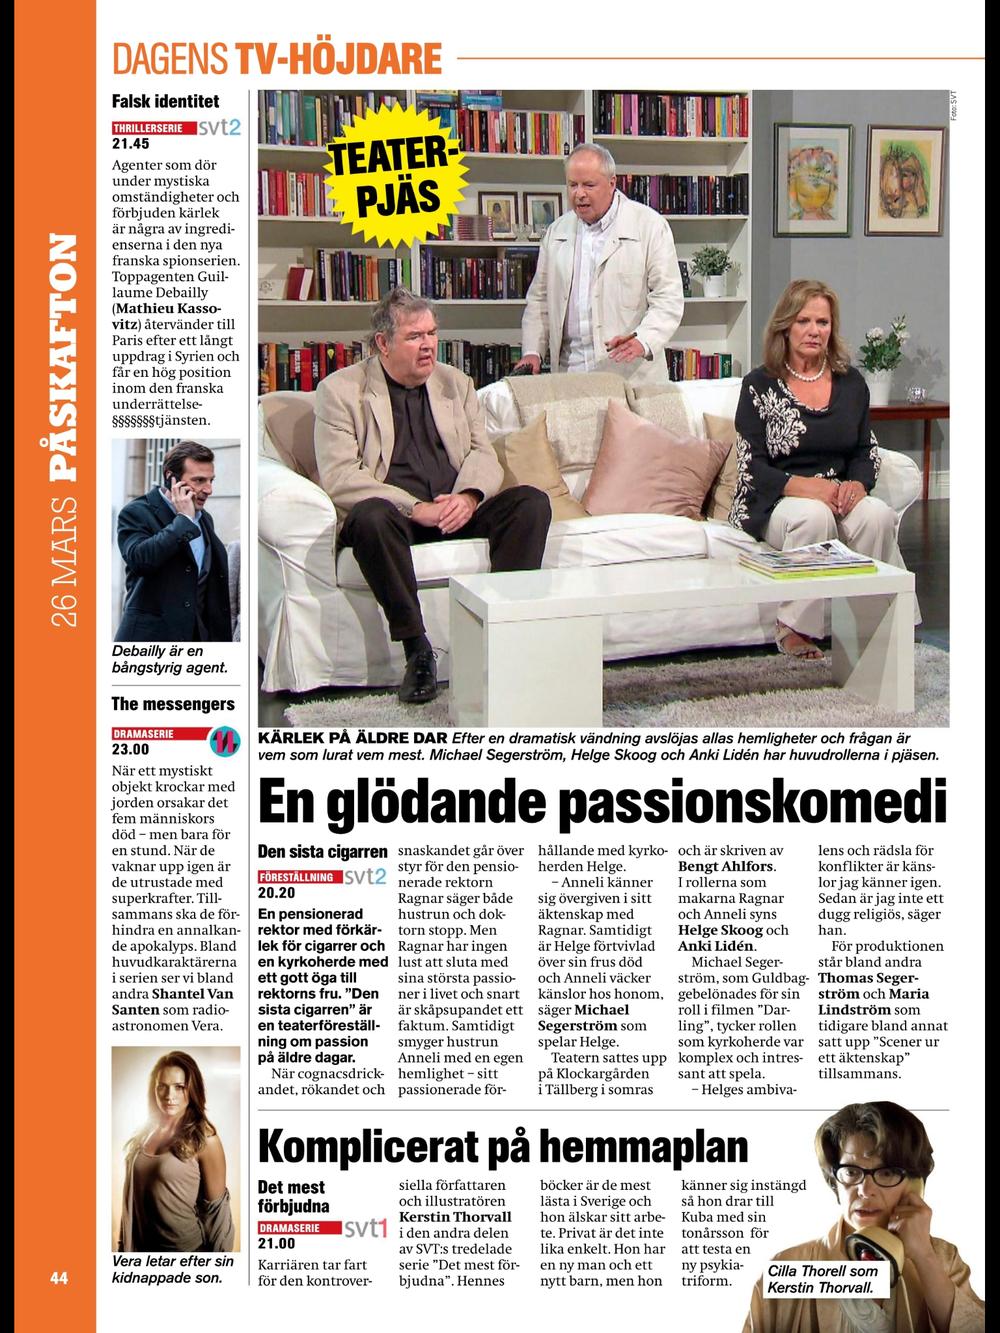 Sida ur Expressens TV-bilaga vecka 12